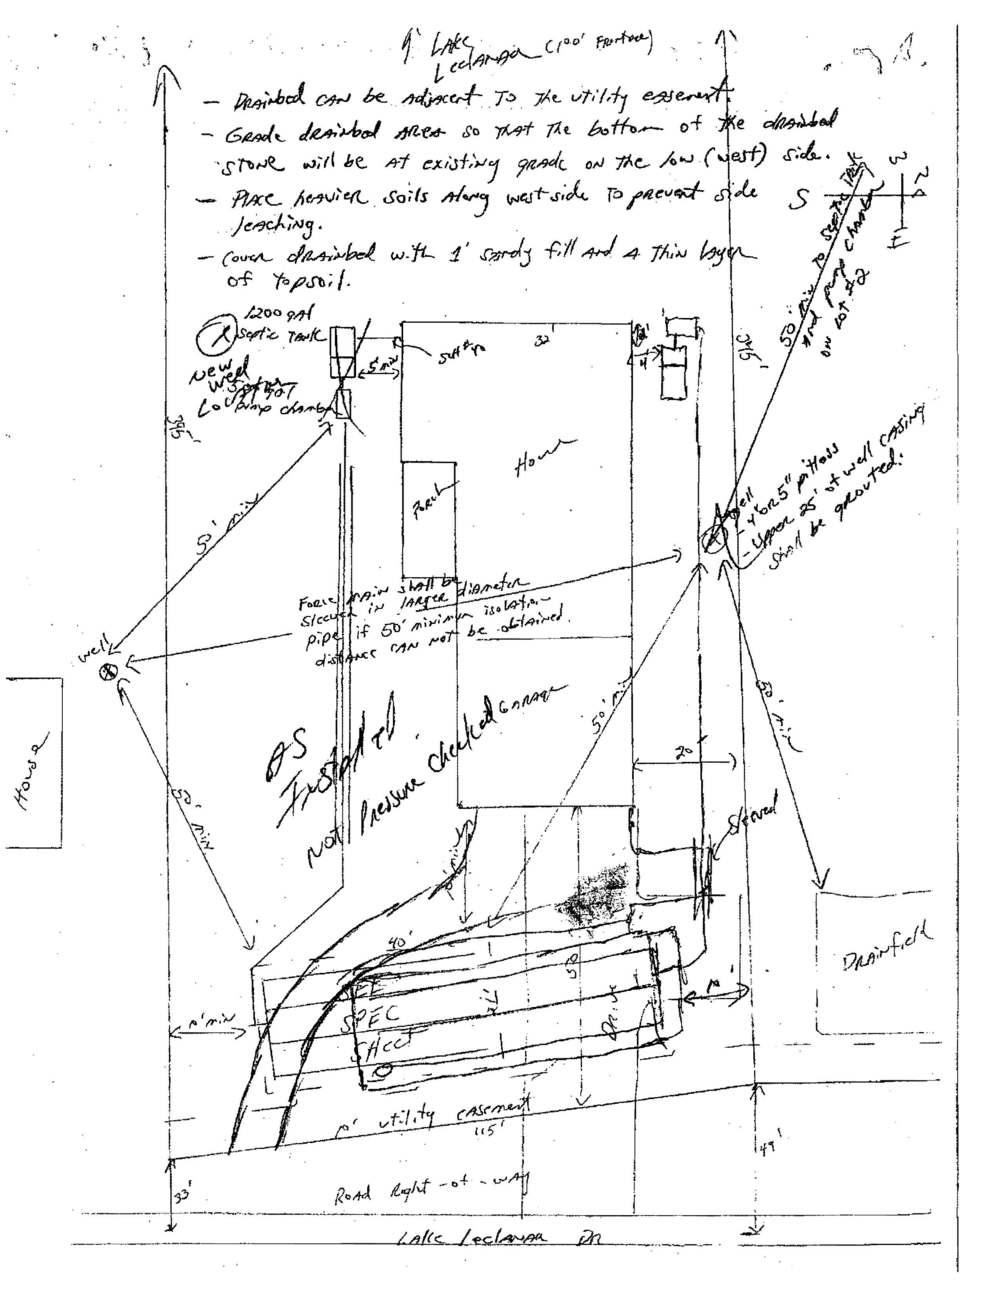 2736 S Lake Leelanau Dr, South Lake Leelanau Waterfront for sale by Oltersdorf Realty LLC - Marketing Packet (20).jpg